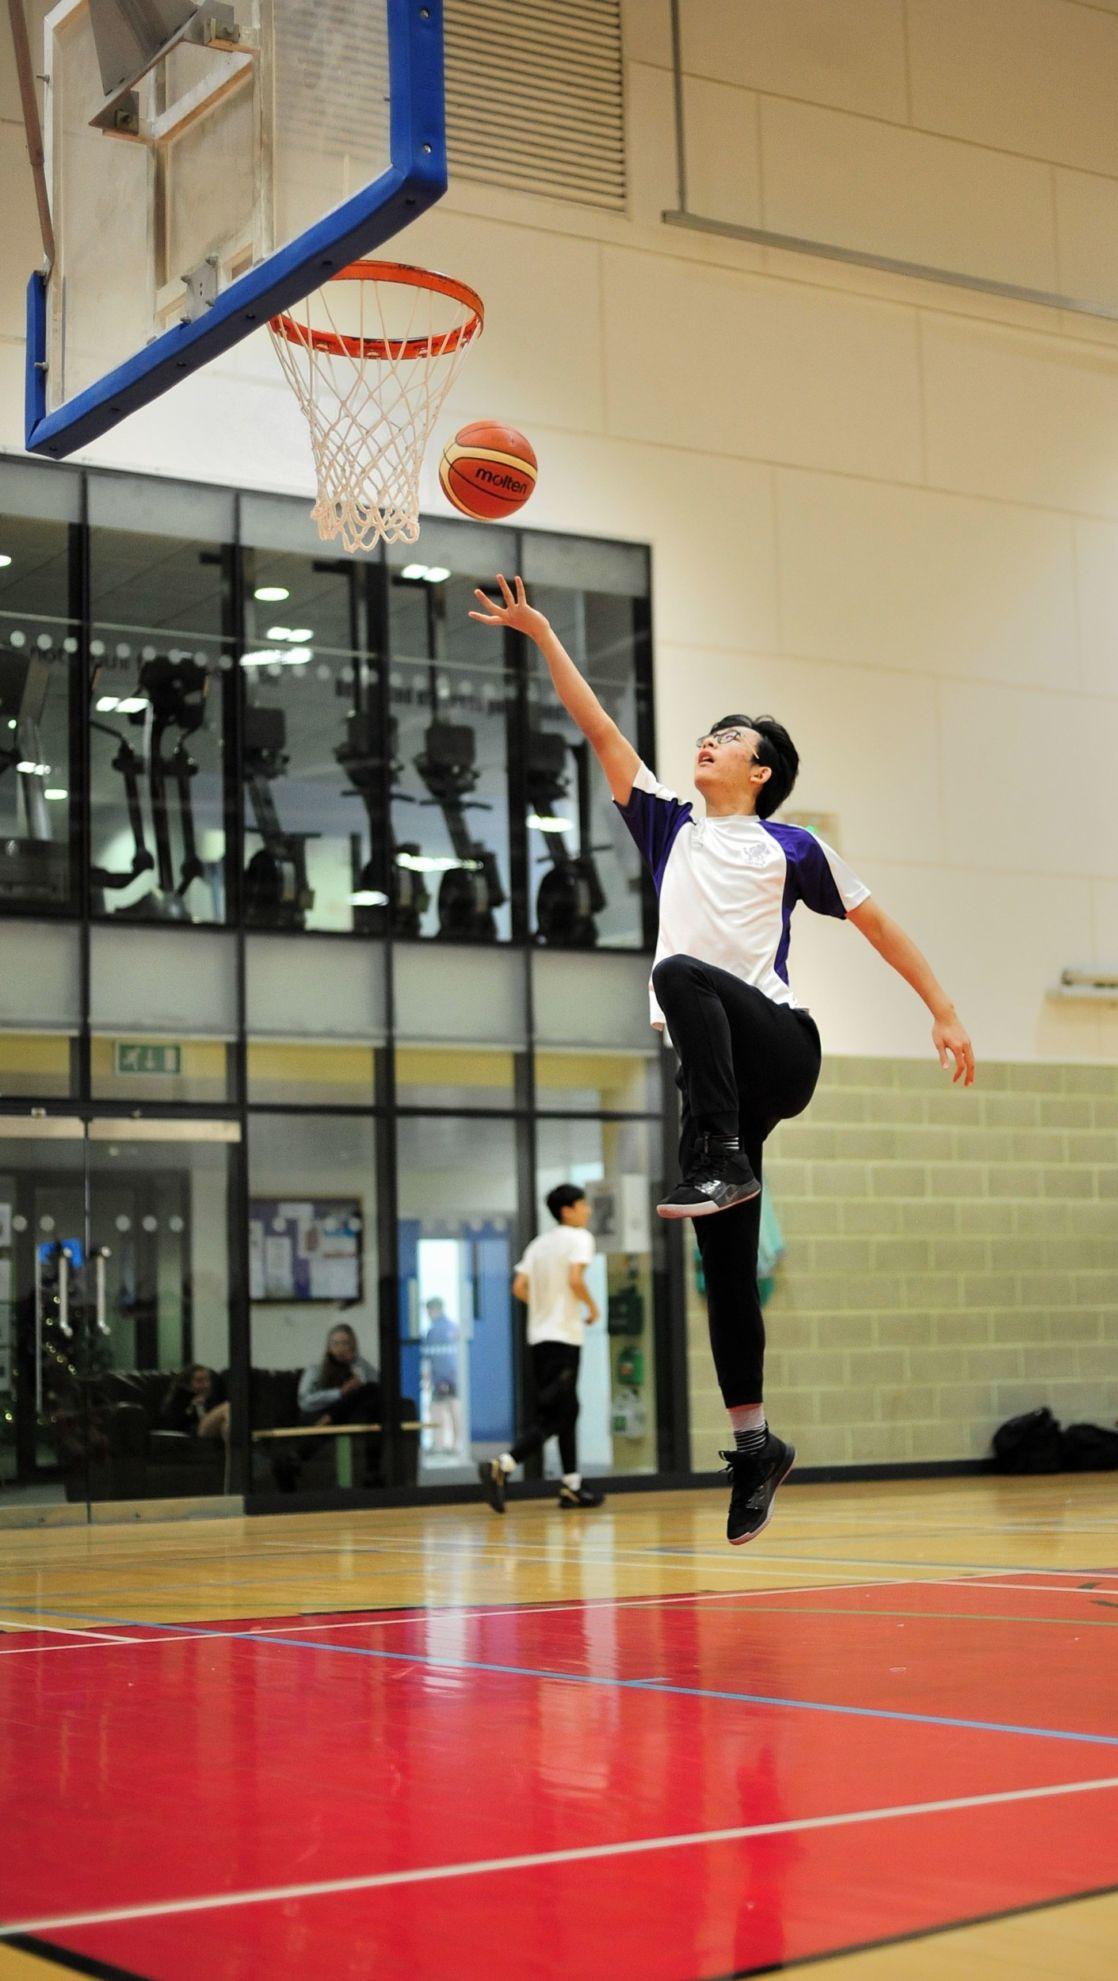 wycliffe pupil playing basketball